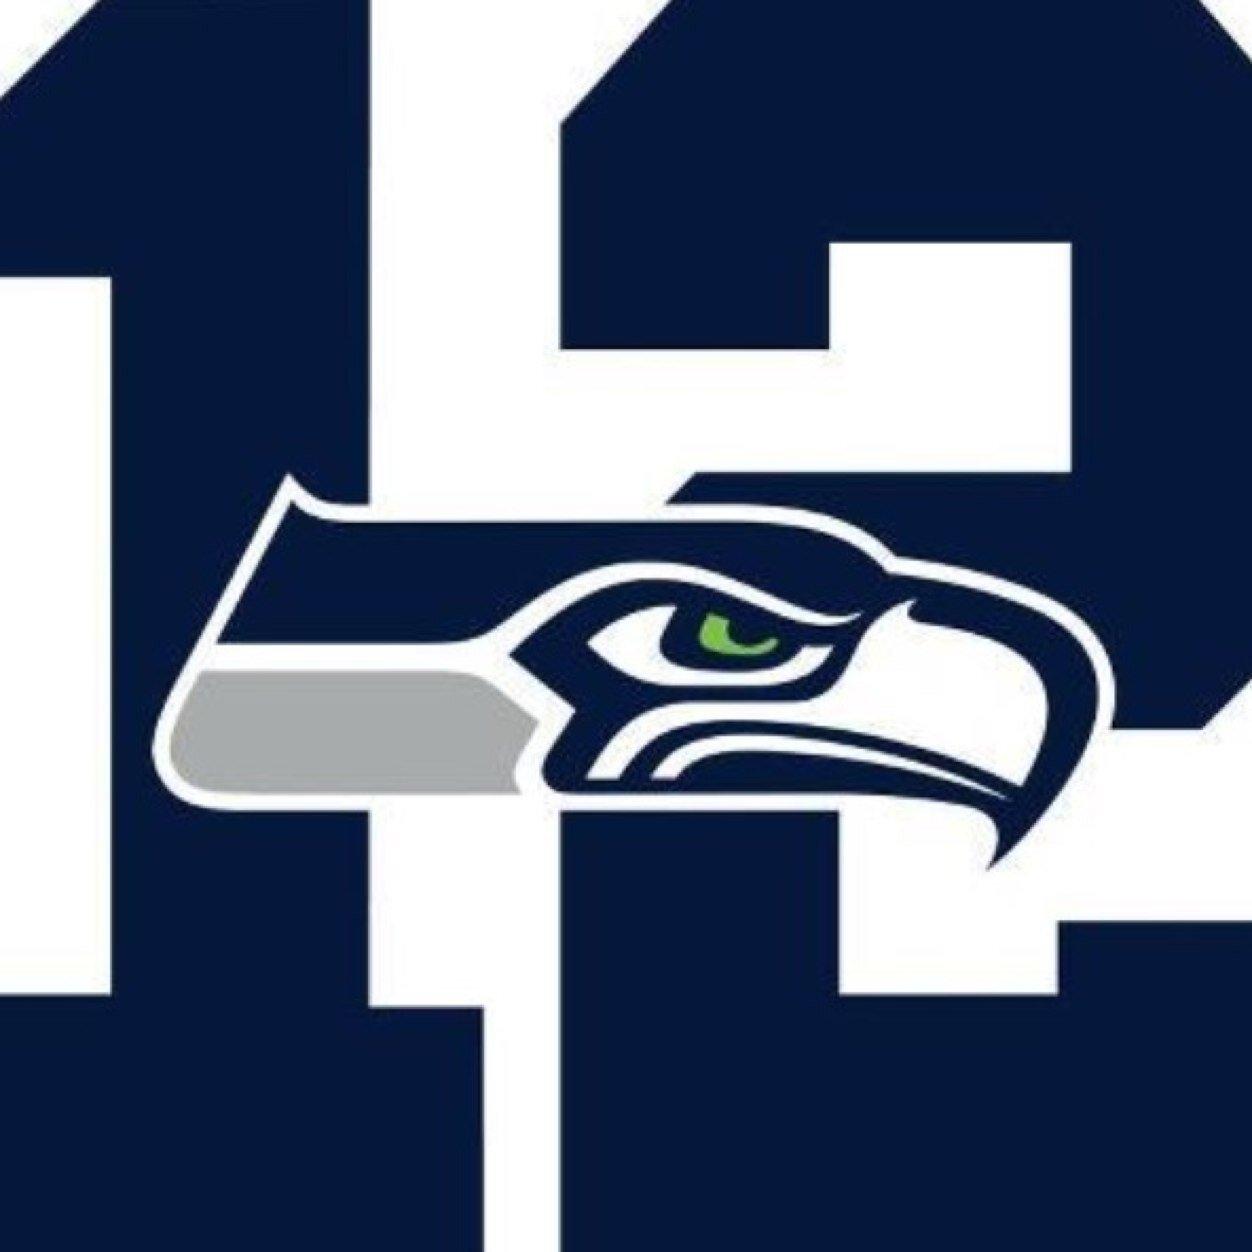 Seahawks 12th man xxseahwaks12xx twitter seahawks 12th man biocorpaavc Image collections